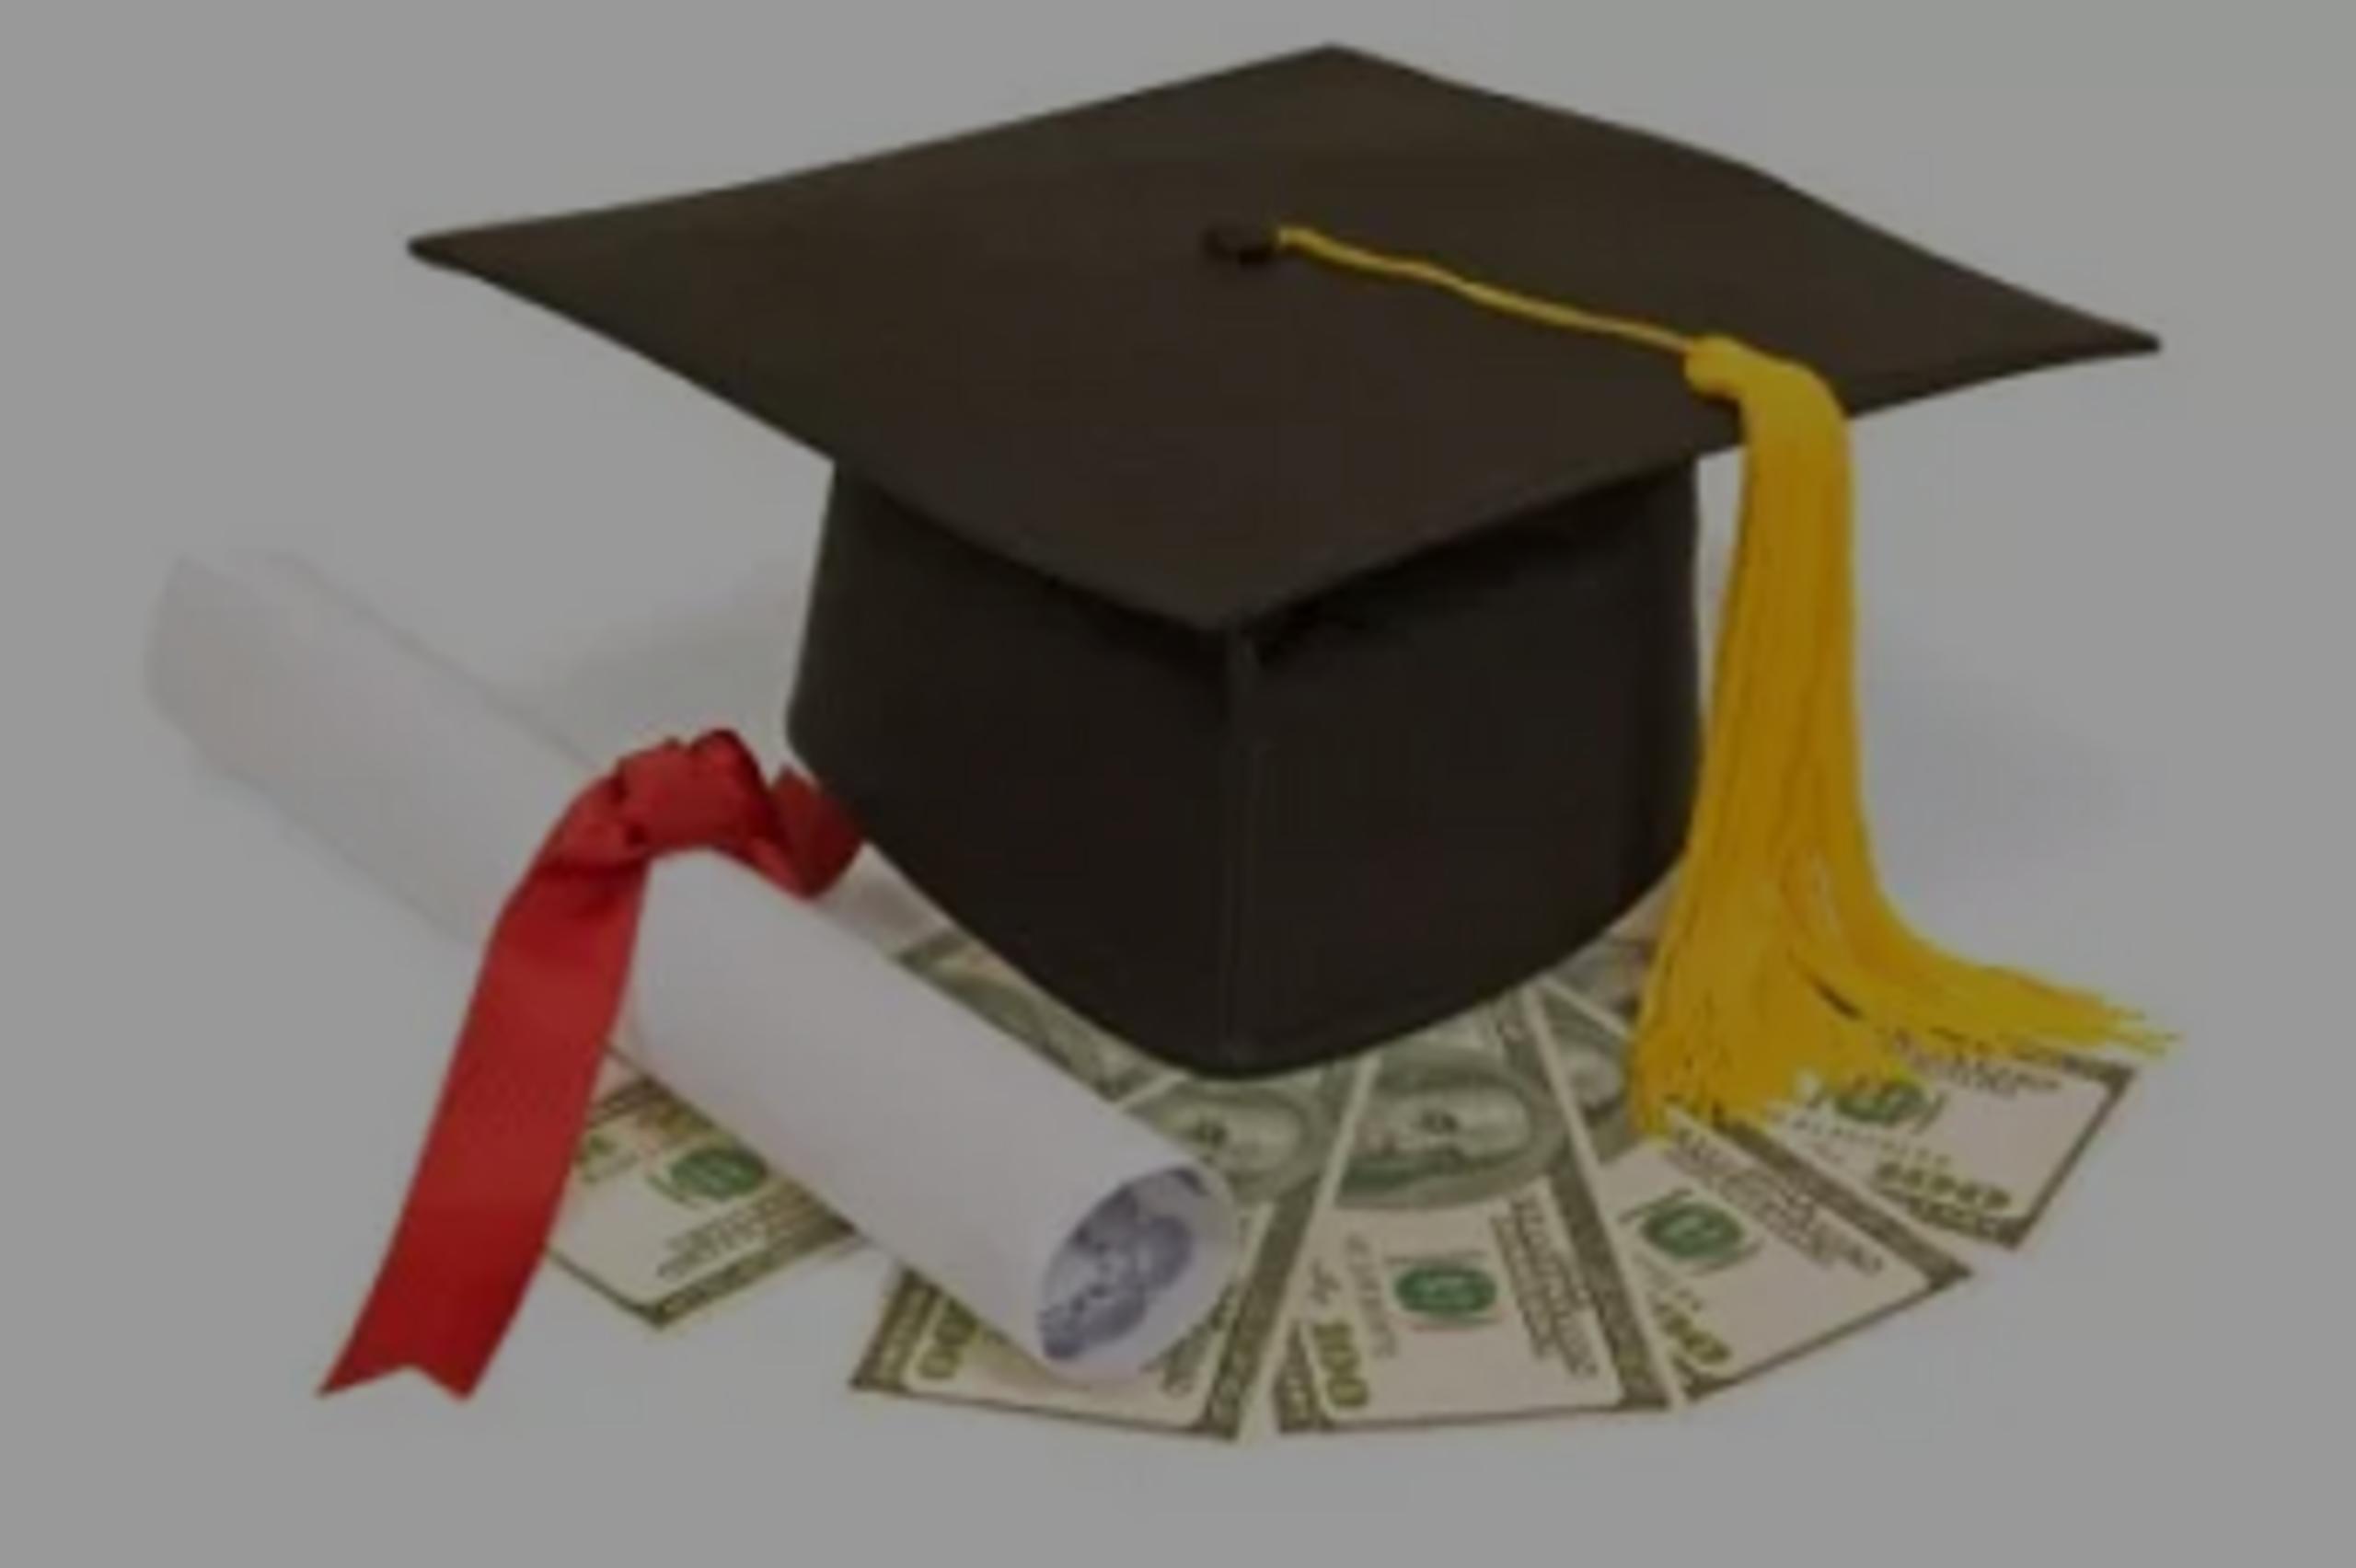 KKeegan Realty 2020 Scholarship